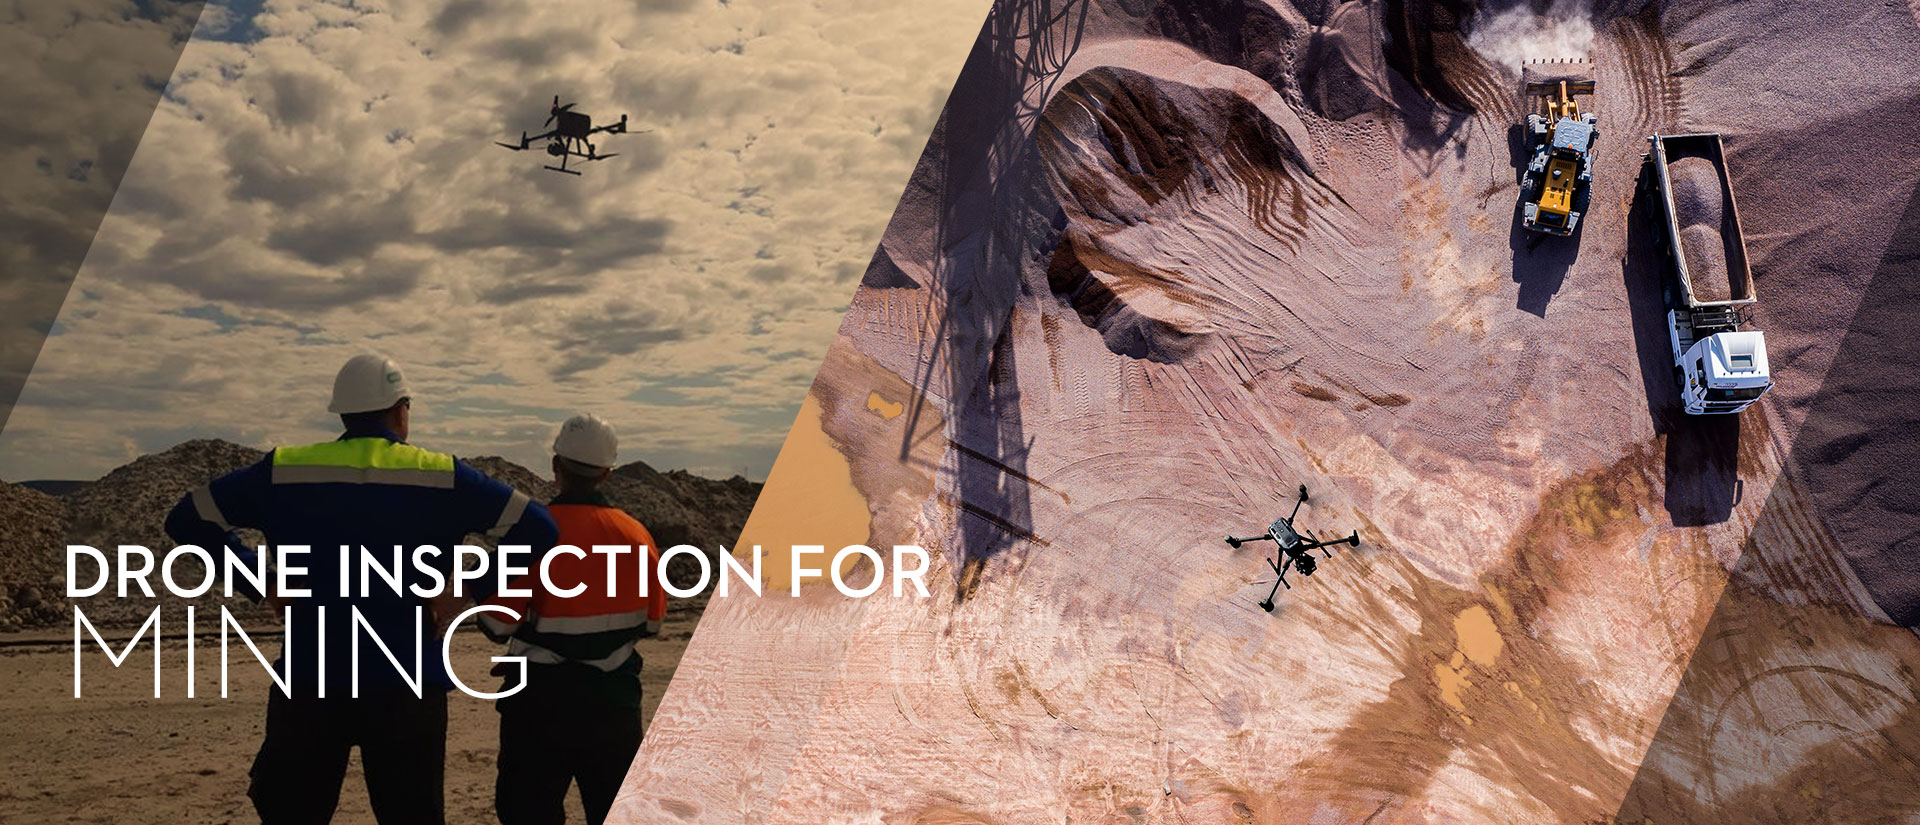 Blog-Drone-Inspection-Mining